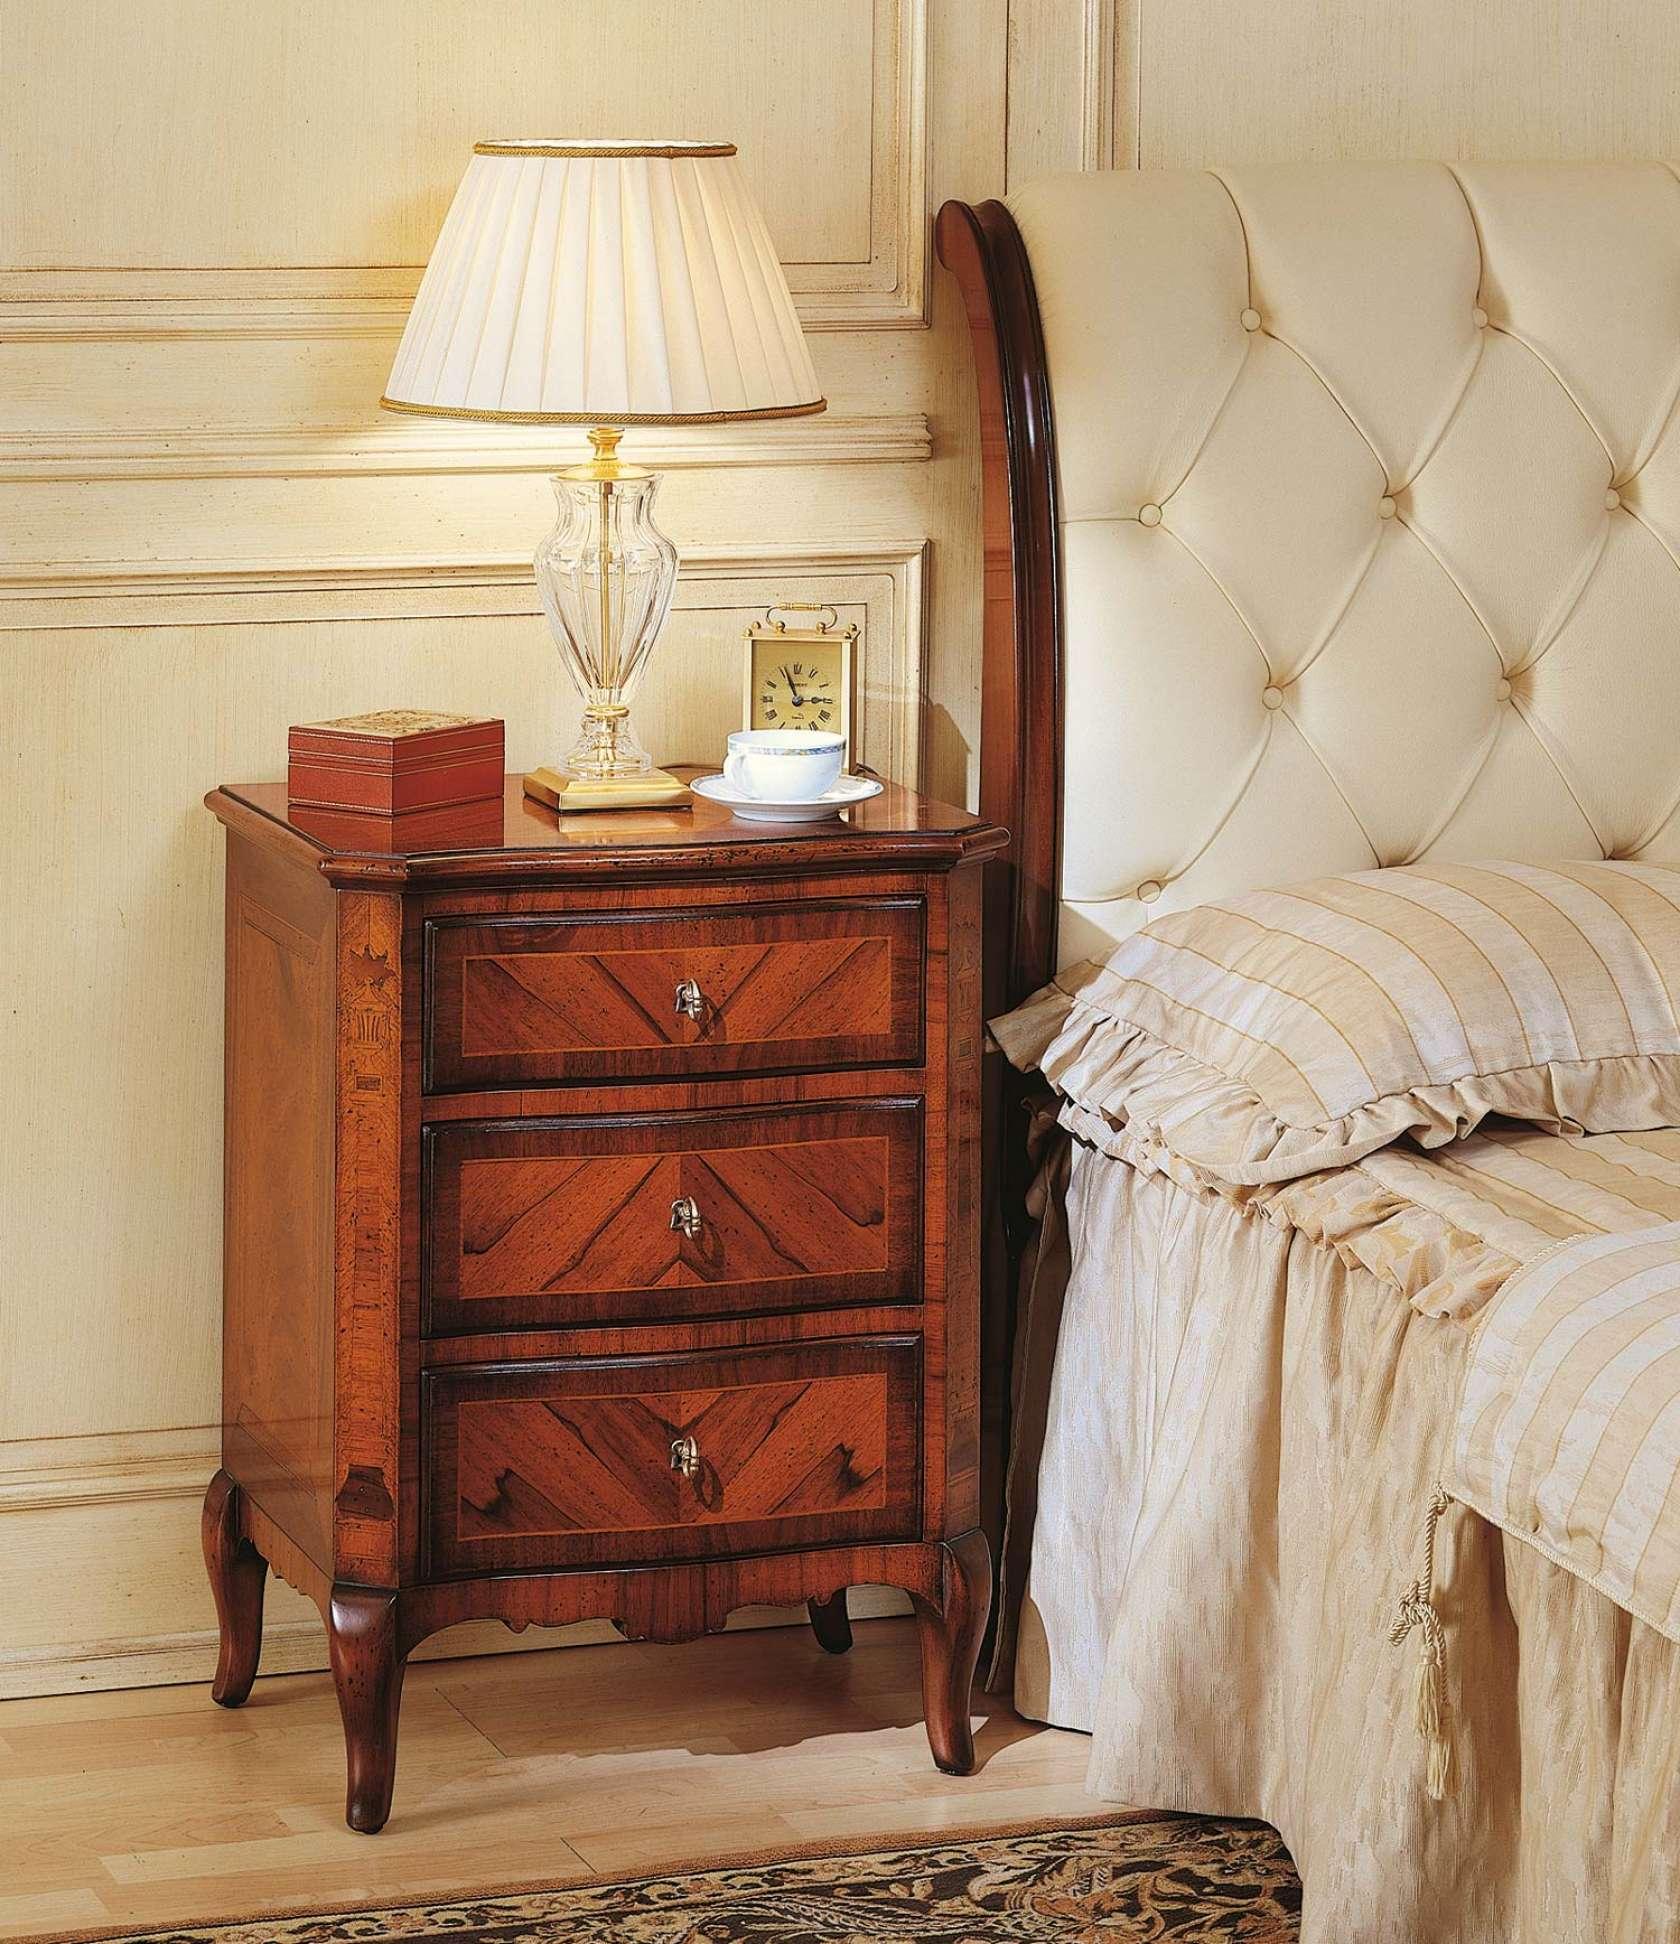 Camera da letto 800 francese, comodino in noce | Vimercati Meda